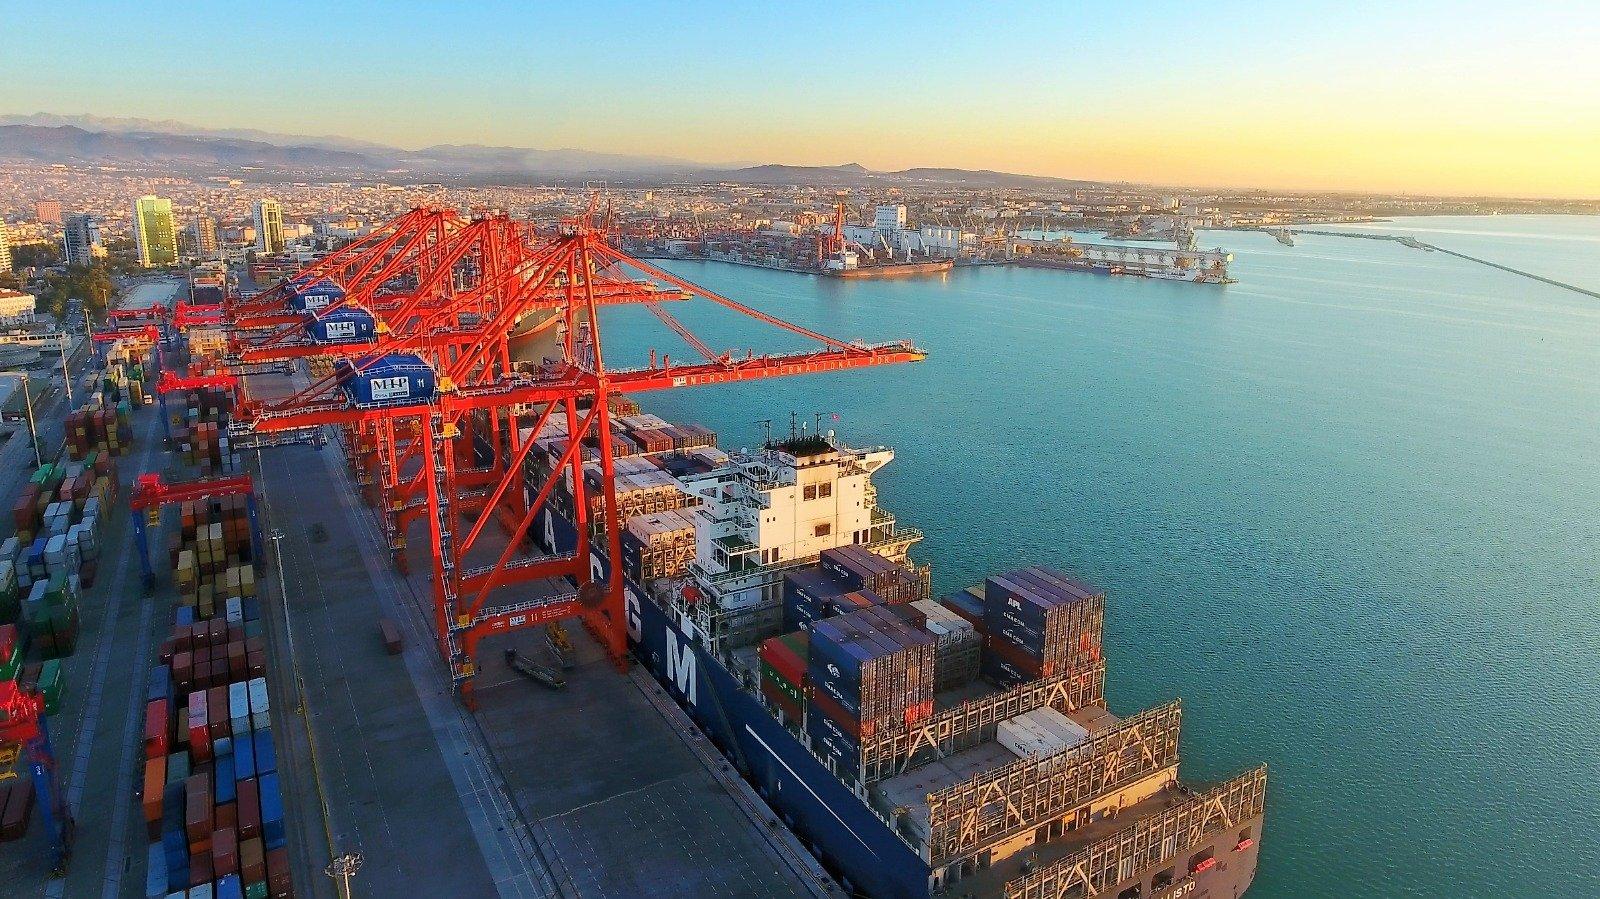 Turkey's shipping port, Mersin